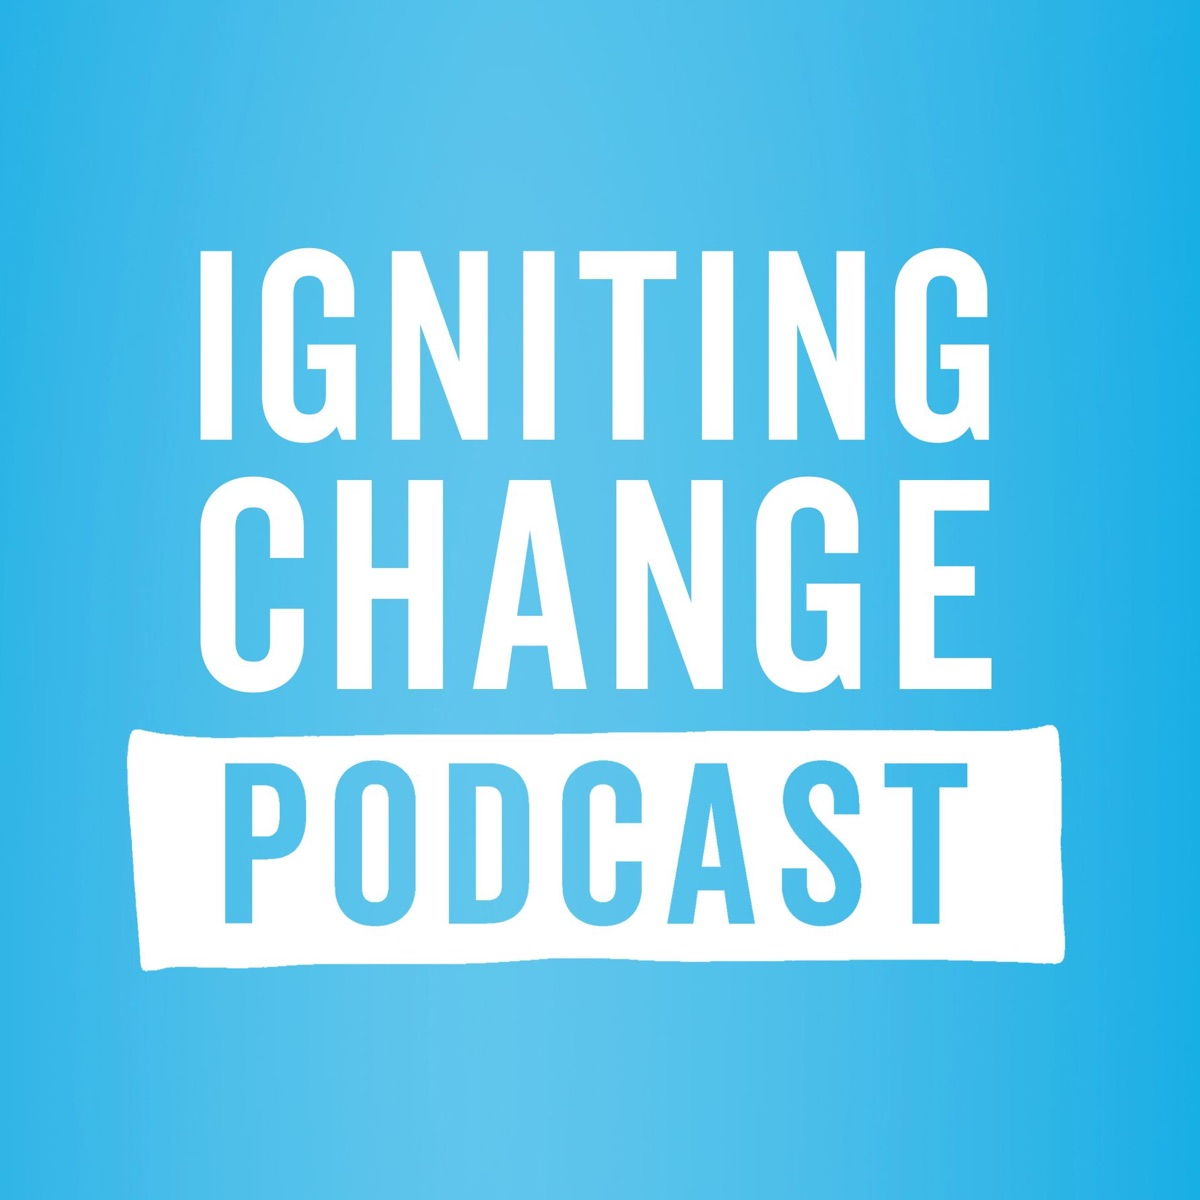 Igniting Change Podcast